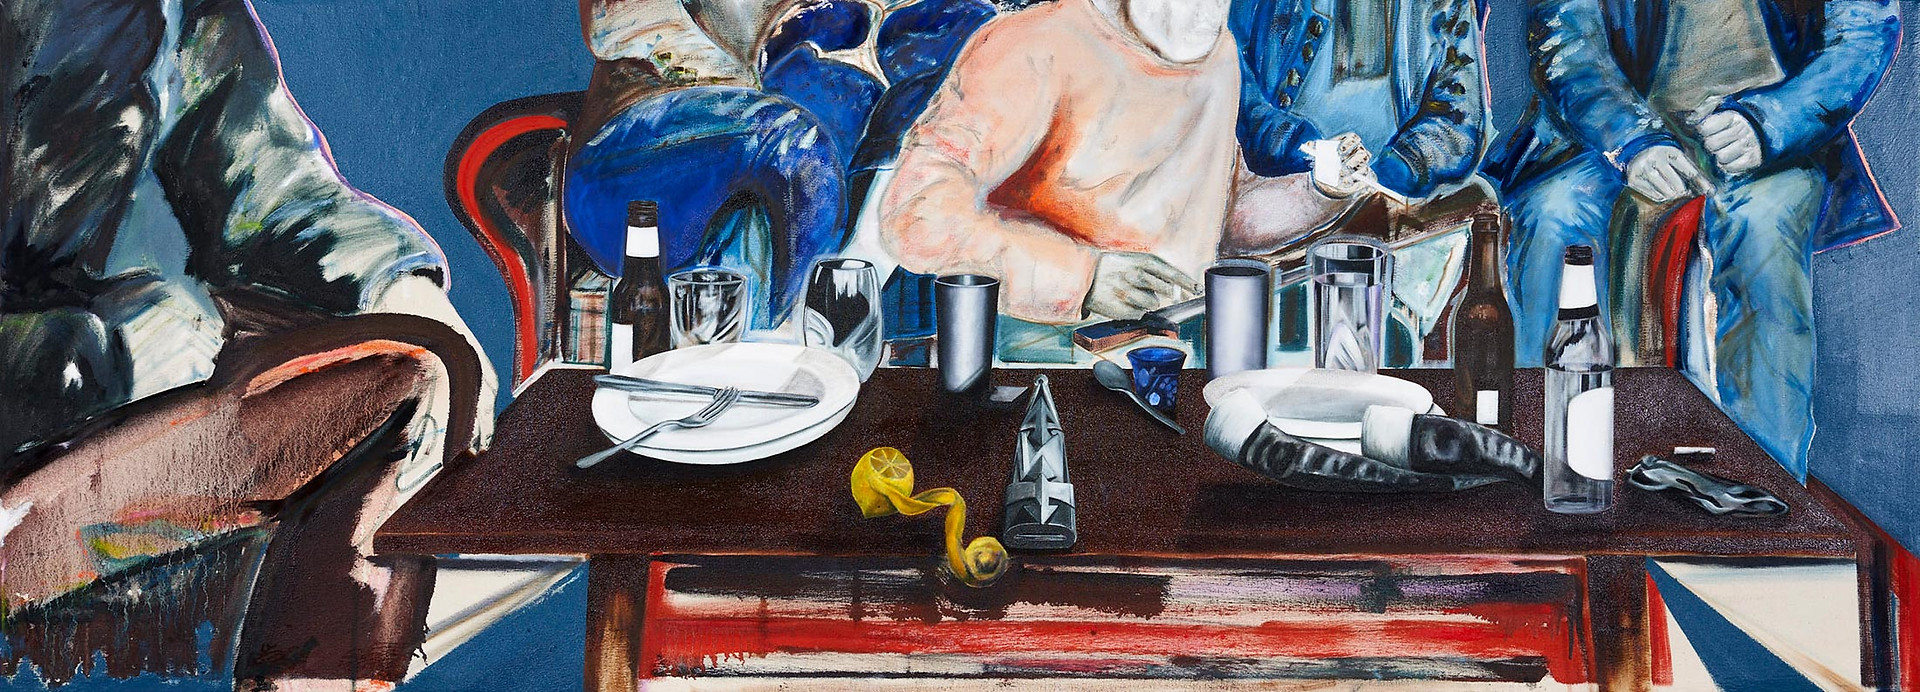 Il Cenacolo, 67 x 182 cm, Oil on Canvas, 2018